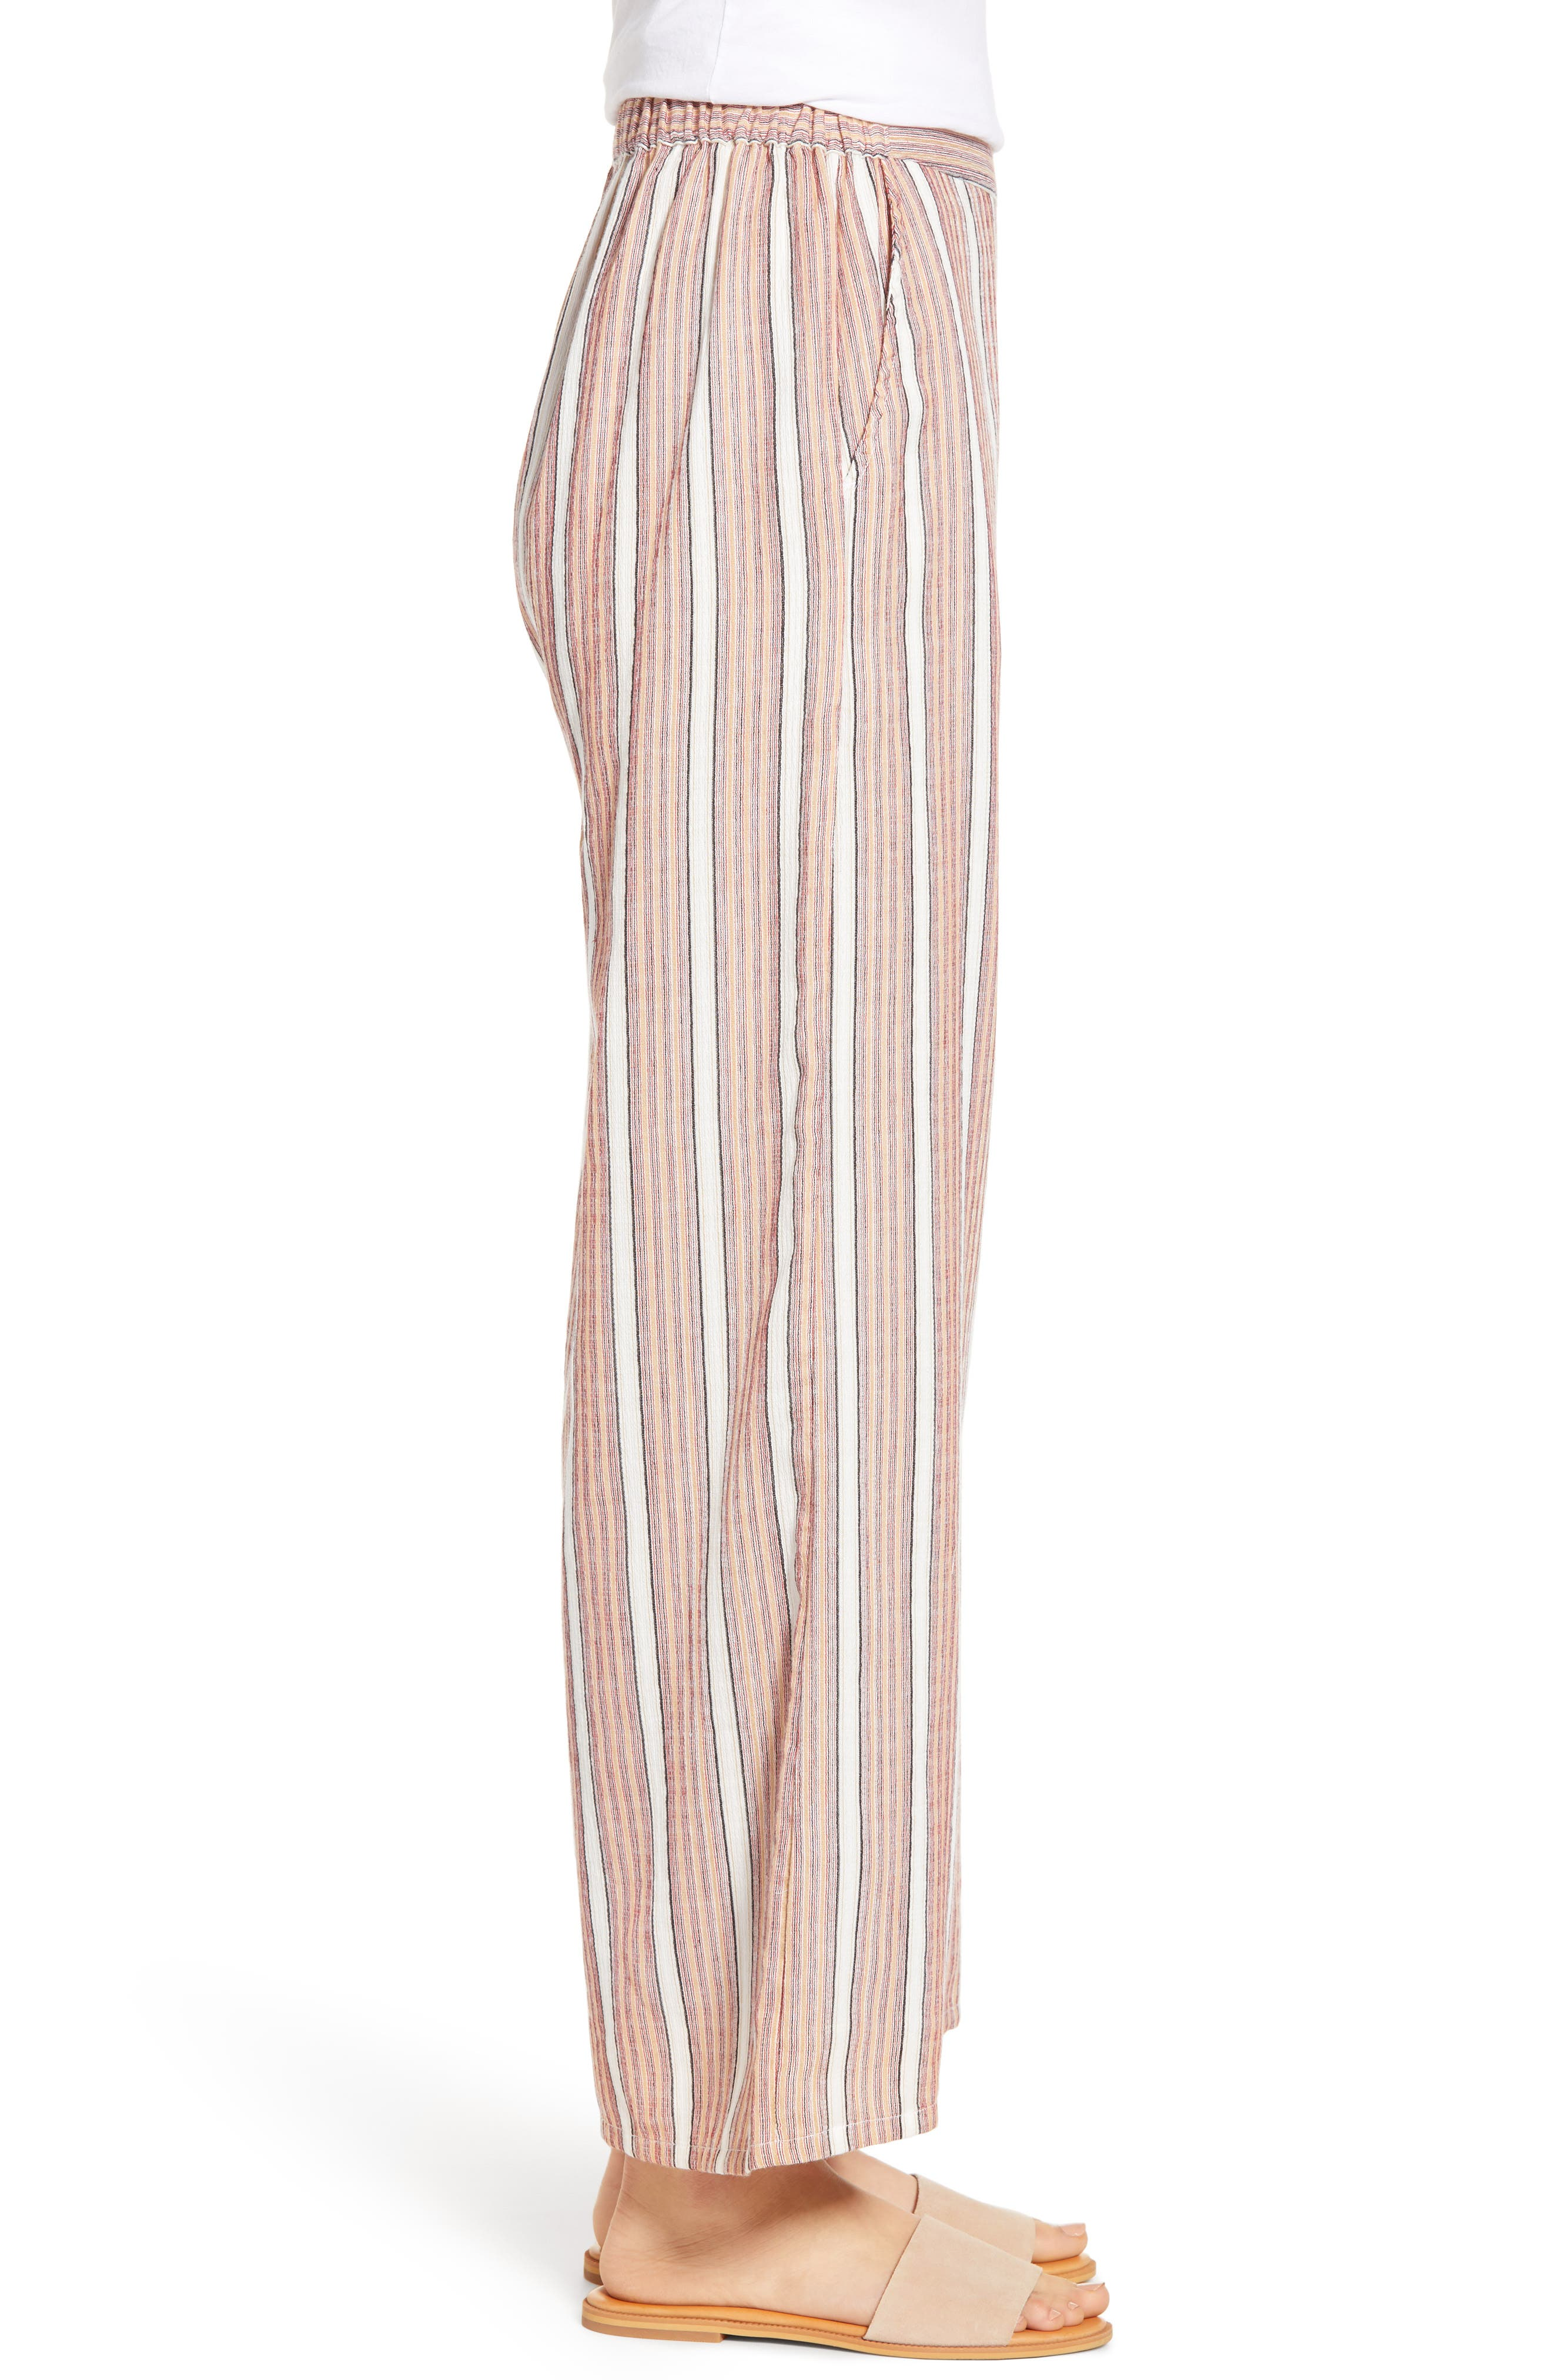 Midnight Avenue Stripe Pants,                             Alternate thumbnail 3, color,                             AMERICAN BEAUTY MULTI STRIPES